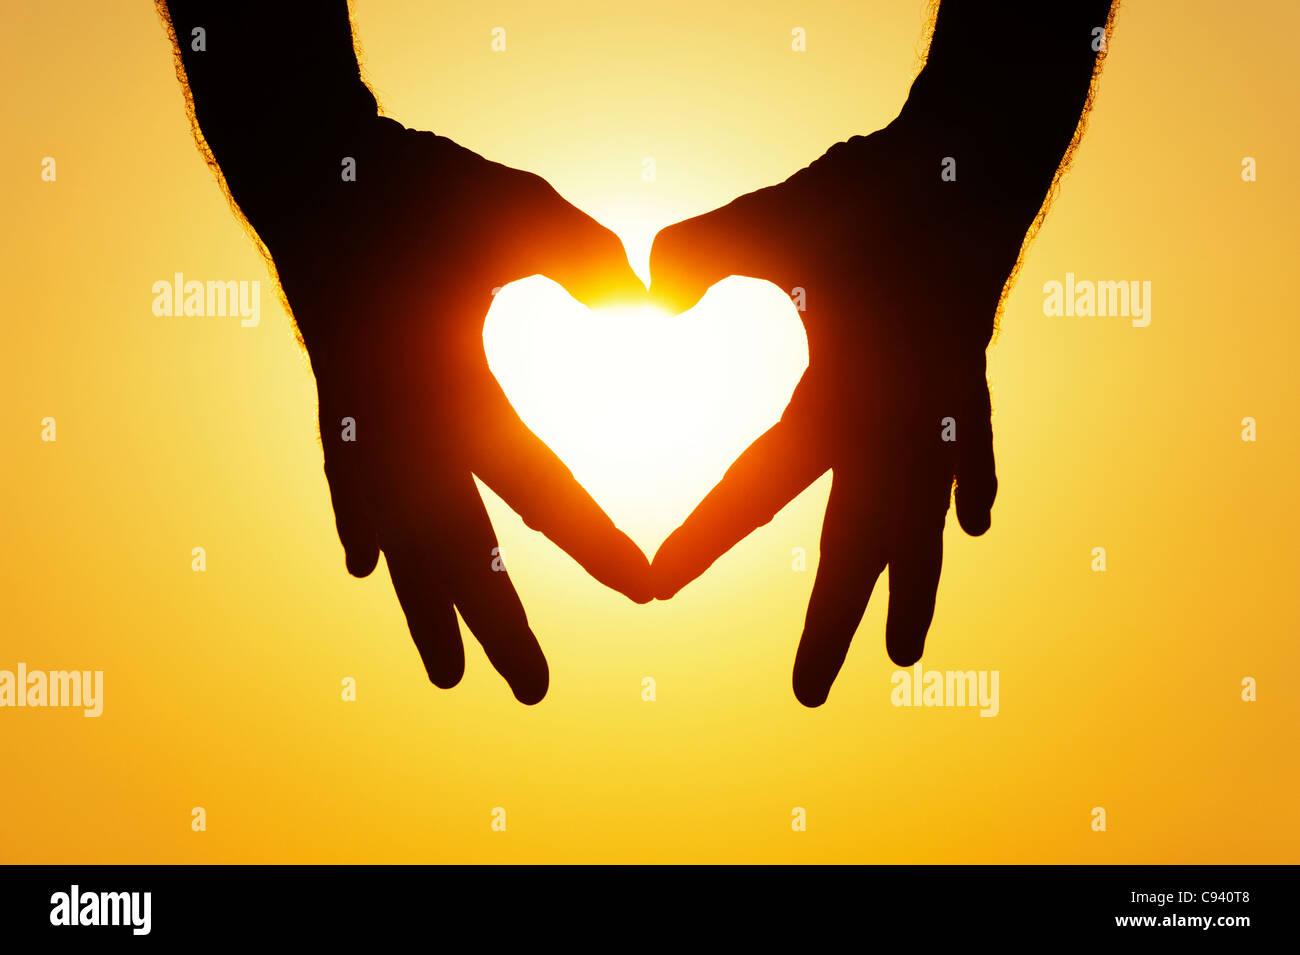 Heart shape hands silhouette against setting sun - Stock Image